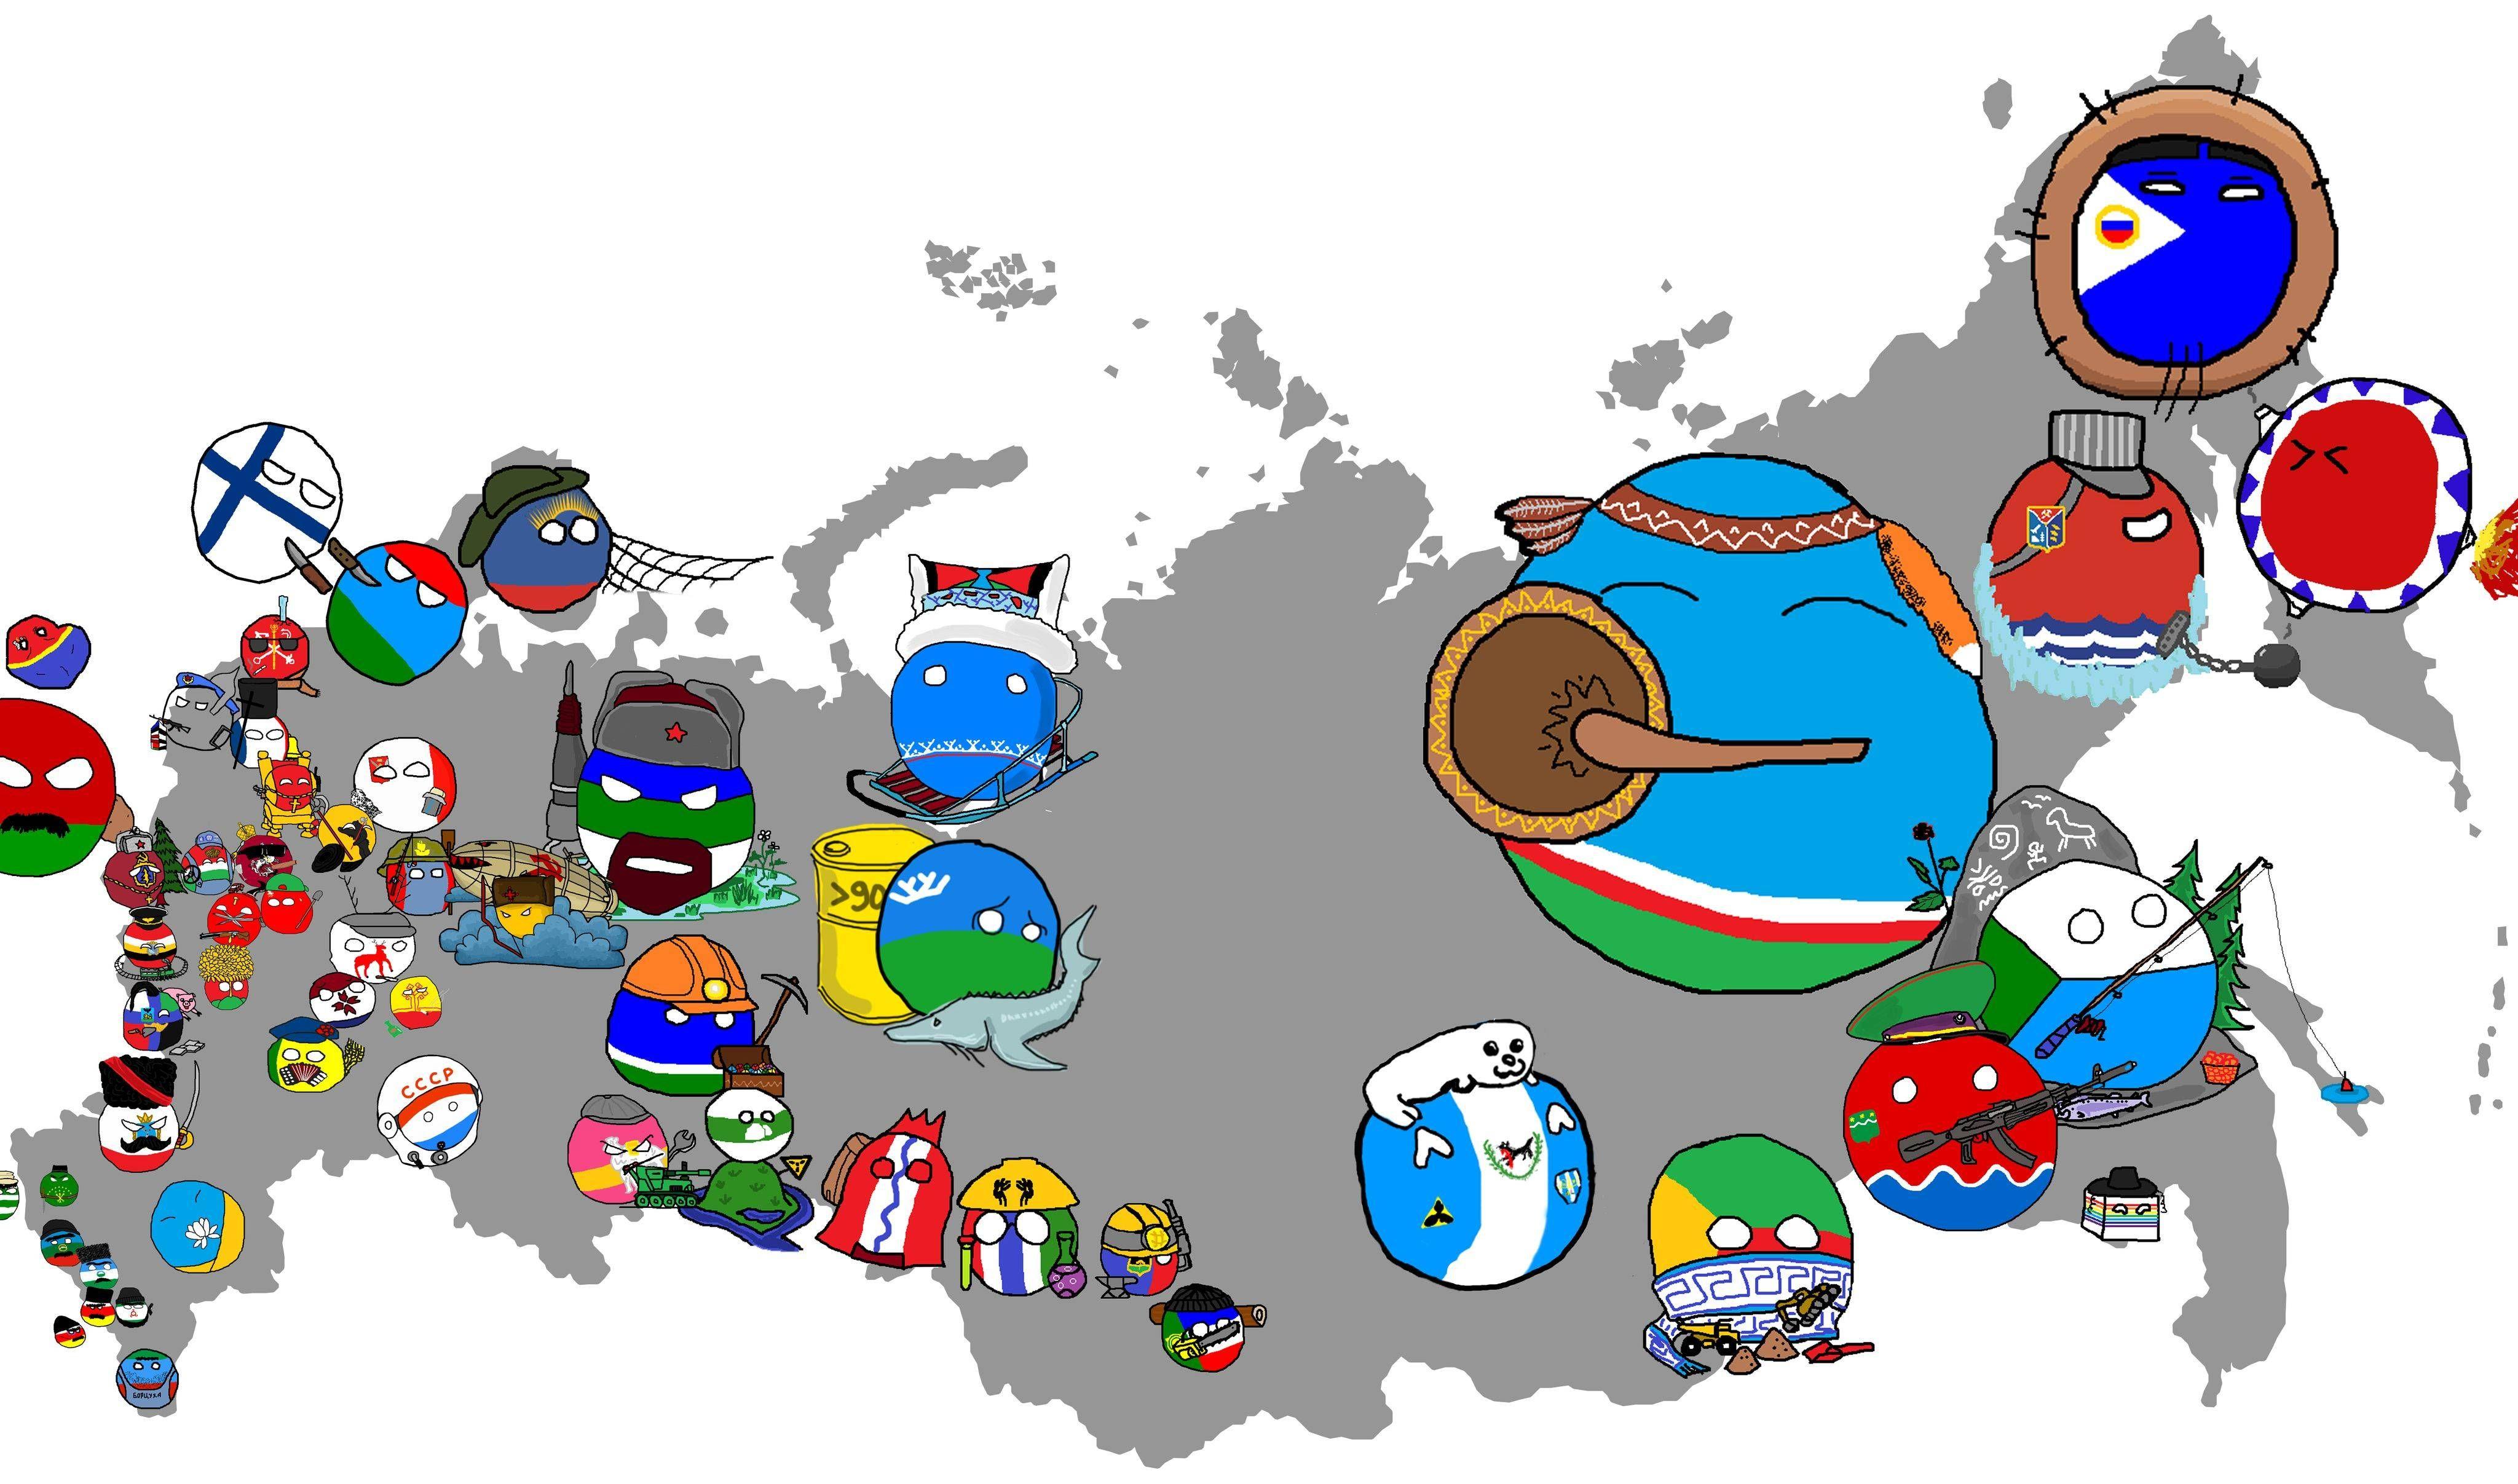 Map of russia by zubermario polandball countryball flagball map of russia by zubermario polandball countryball flagball gumiabroncs Choice Image